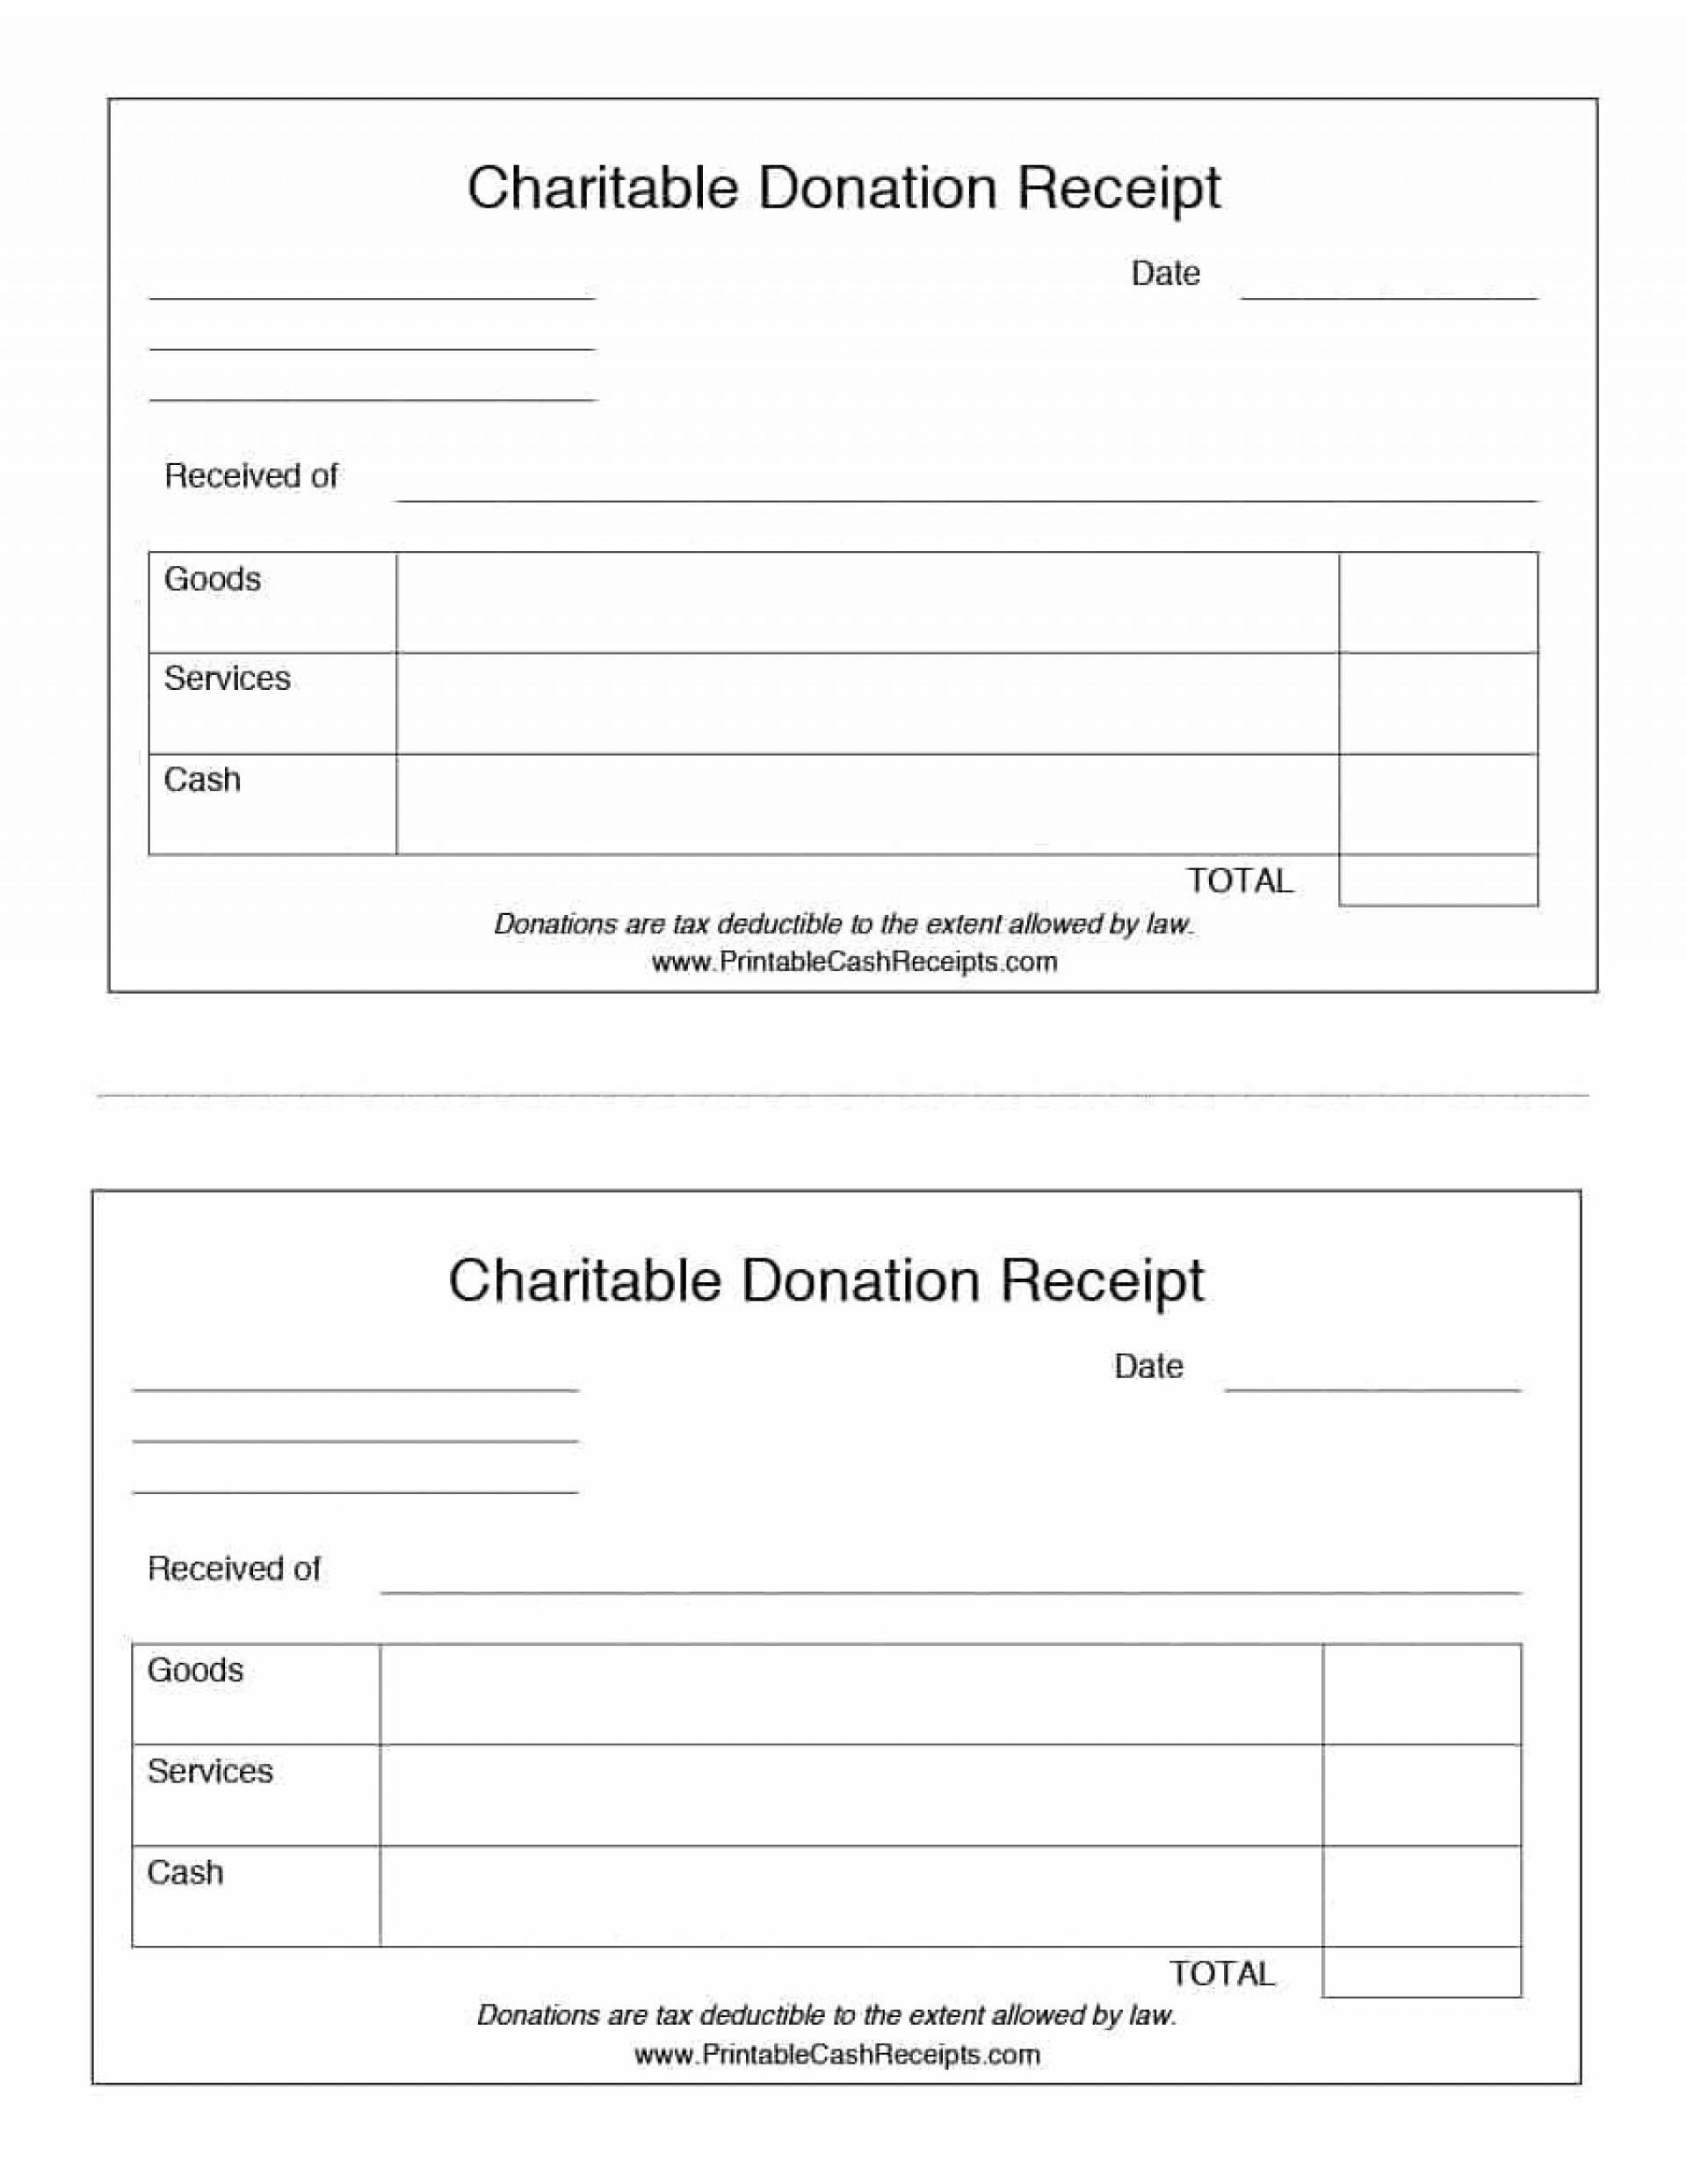 000 Singular Tax Donation Form Template High Definition  Ir Charitable Receipt Deductible Example1920